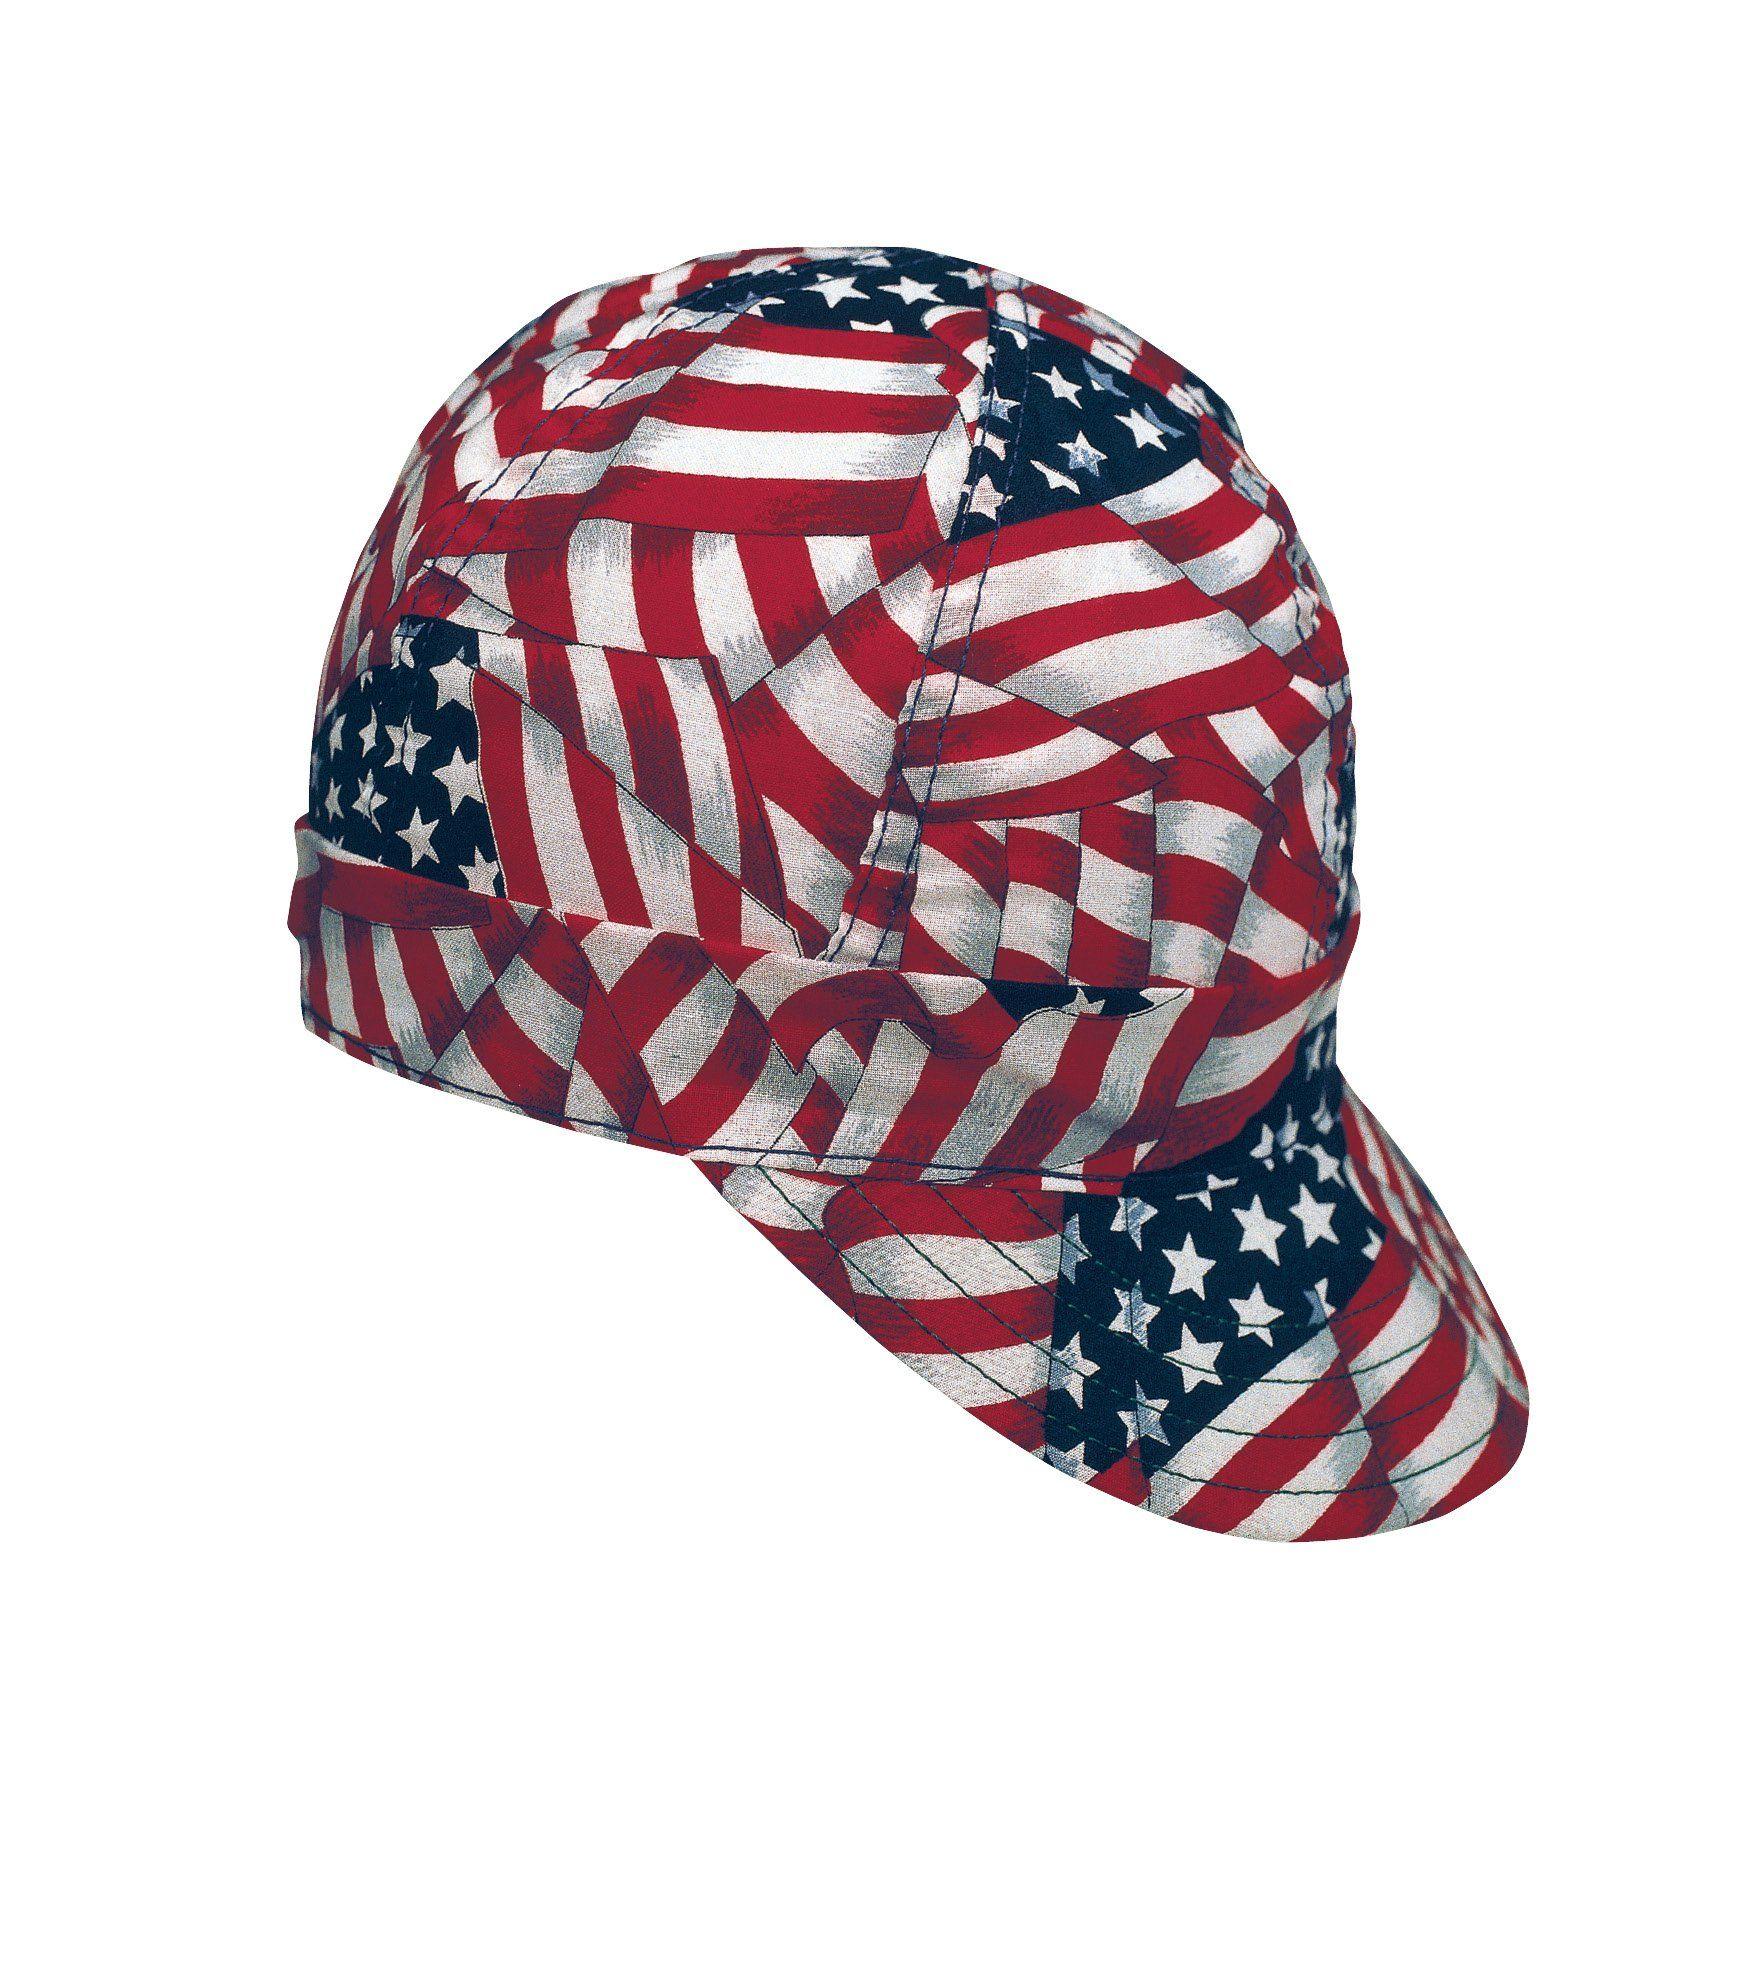 Mutual Industries 00336 00000 6875 Kromer Usa Flag Style Welder Cap 6 7 8 Cotton Length 5 Width 6 Ad Kromer Affiliate Us Welder Cap Usa Flag Style